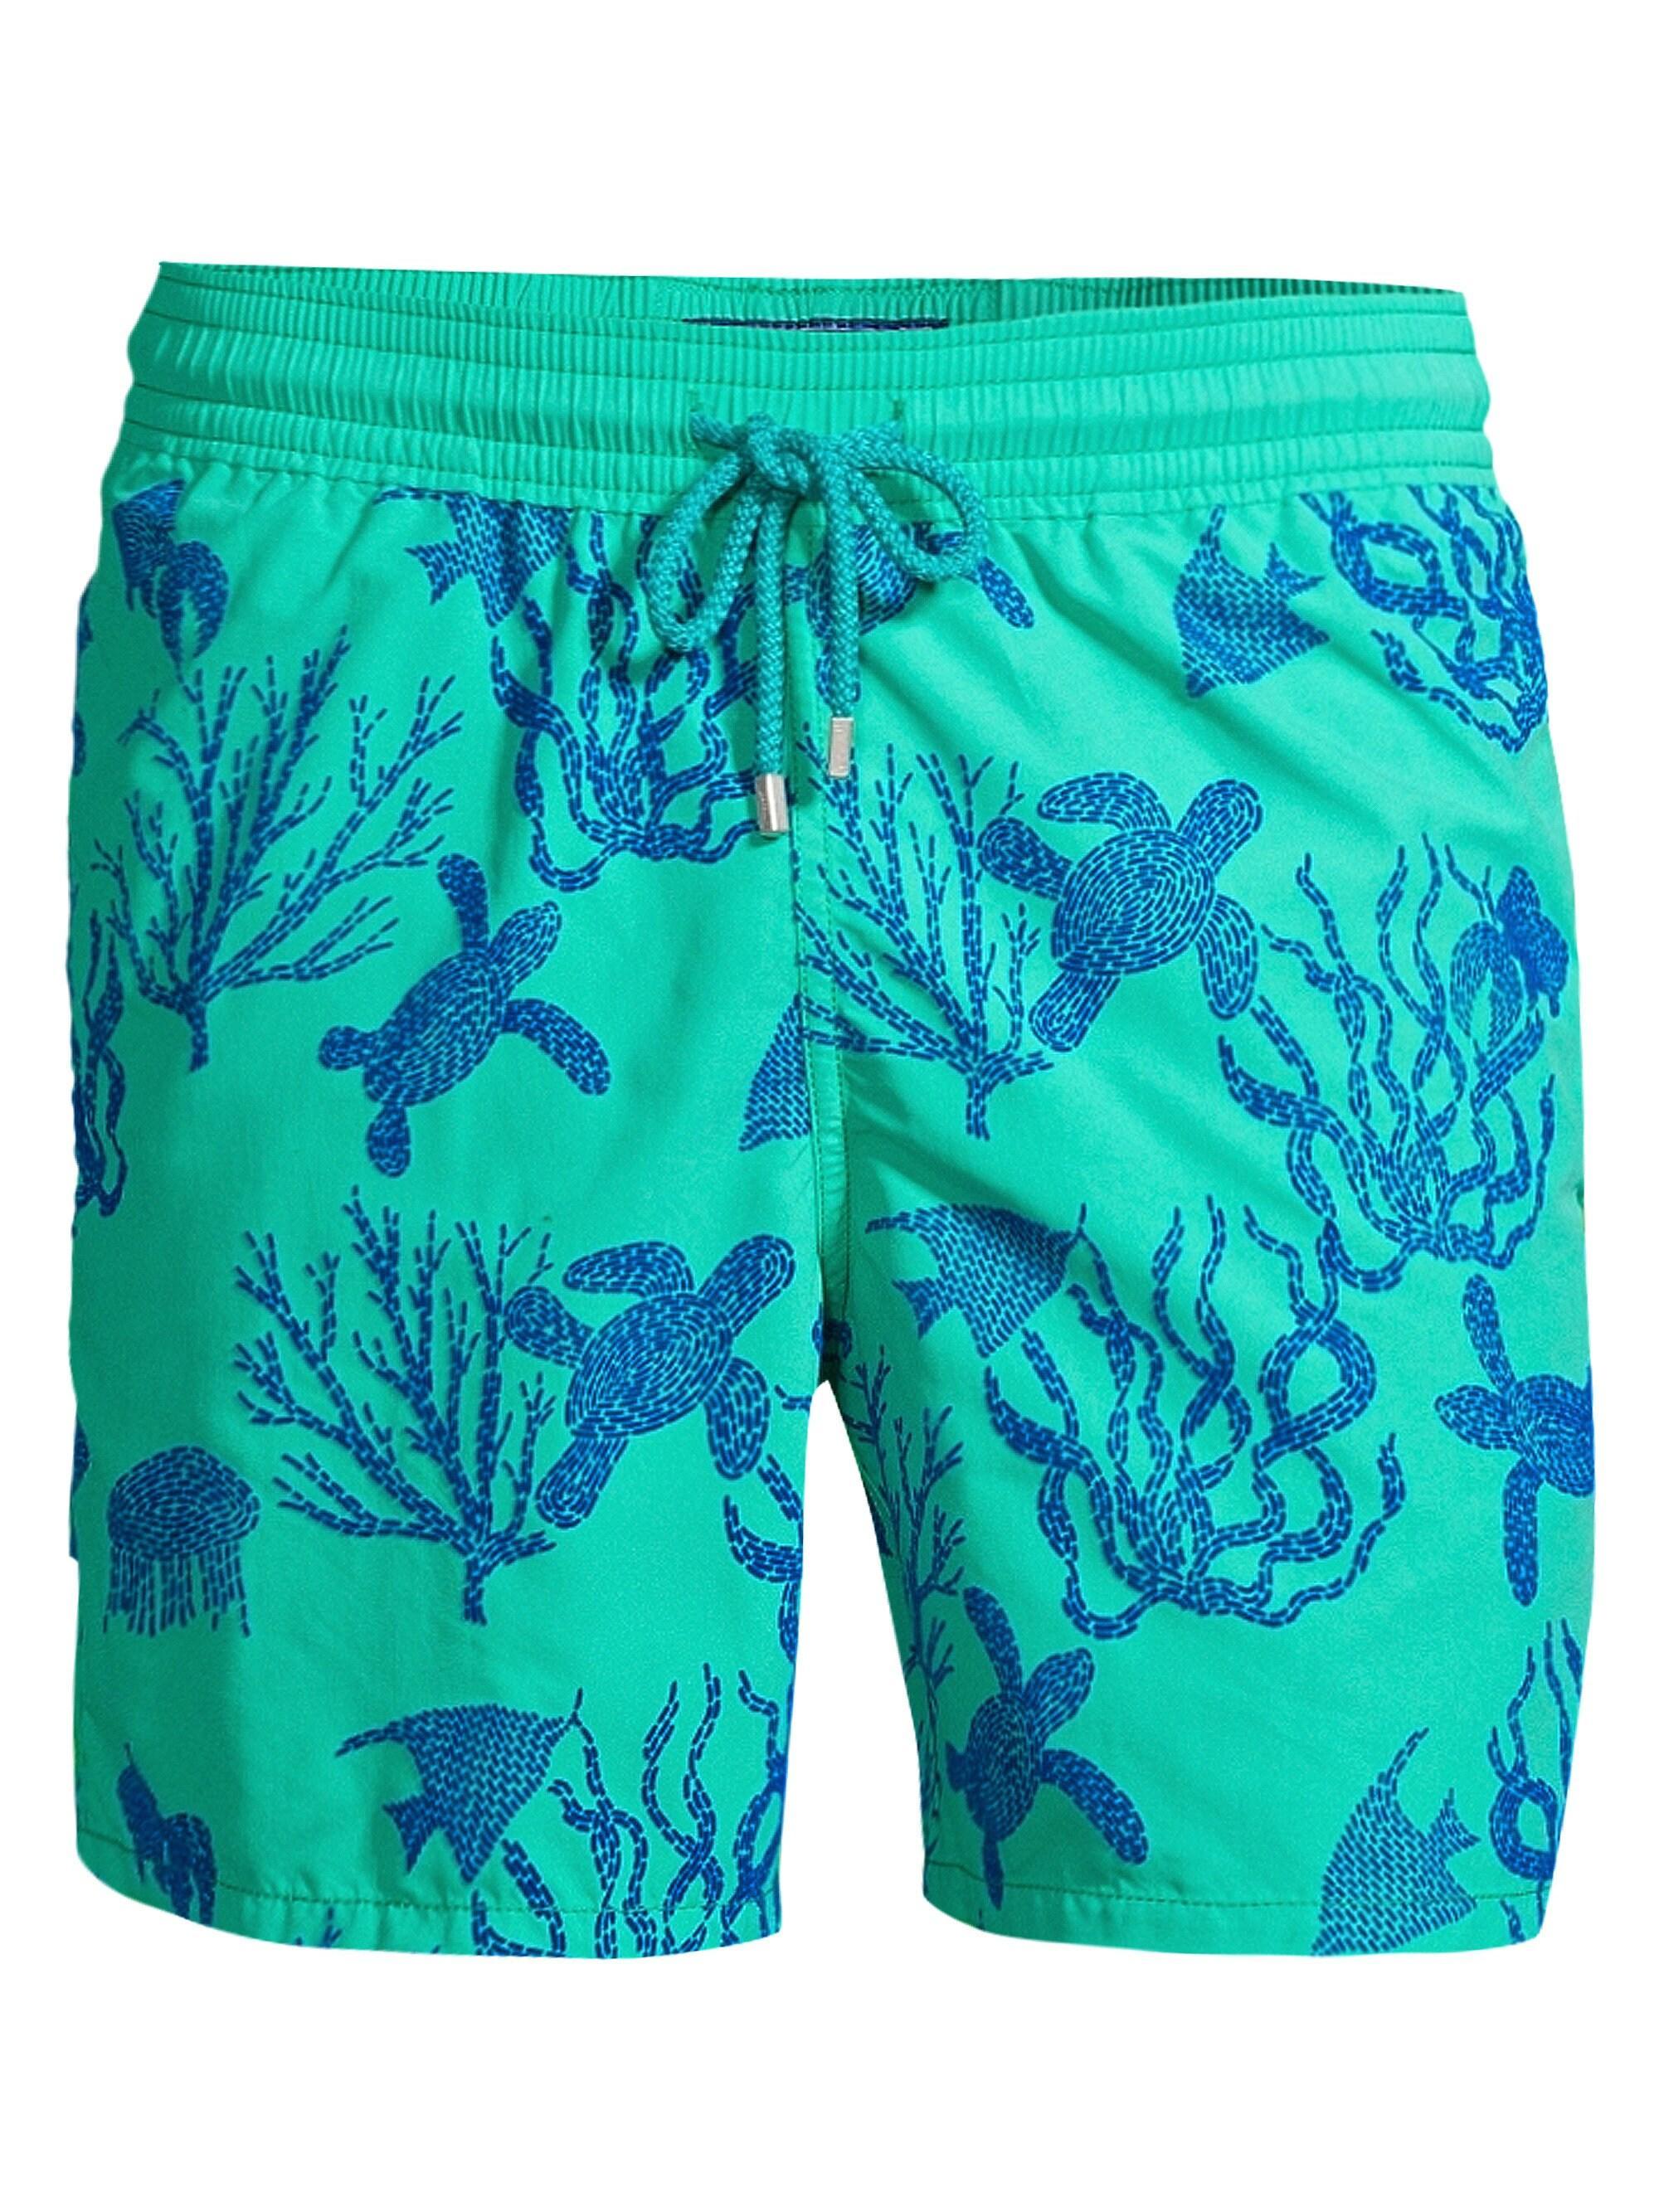 f4853c4a51 Vilebrequin Men's Coral Turtles Print Swim Shorts - Green in Green ...